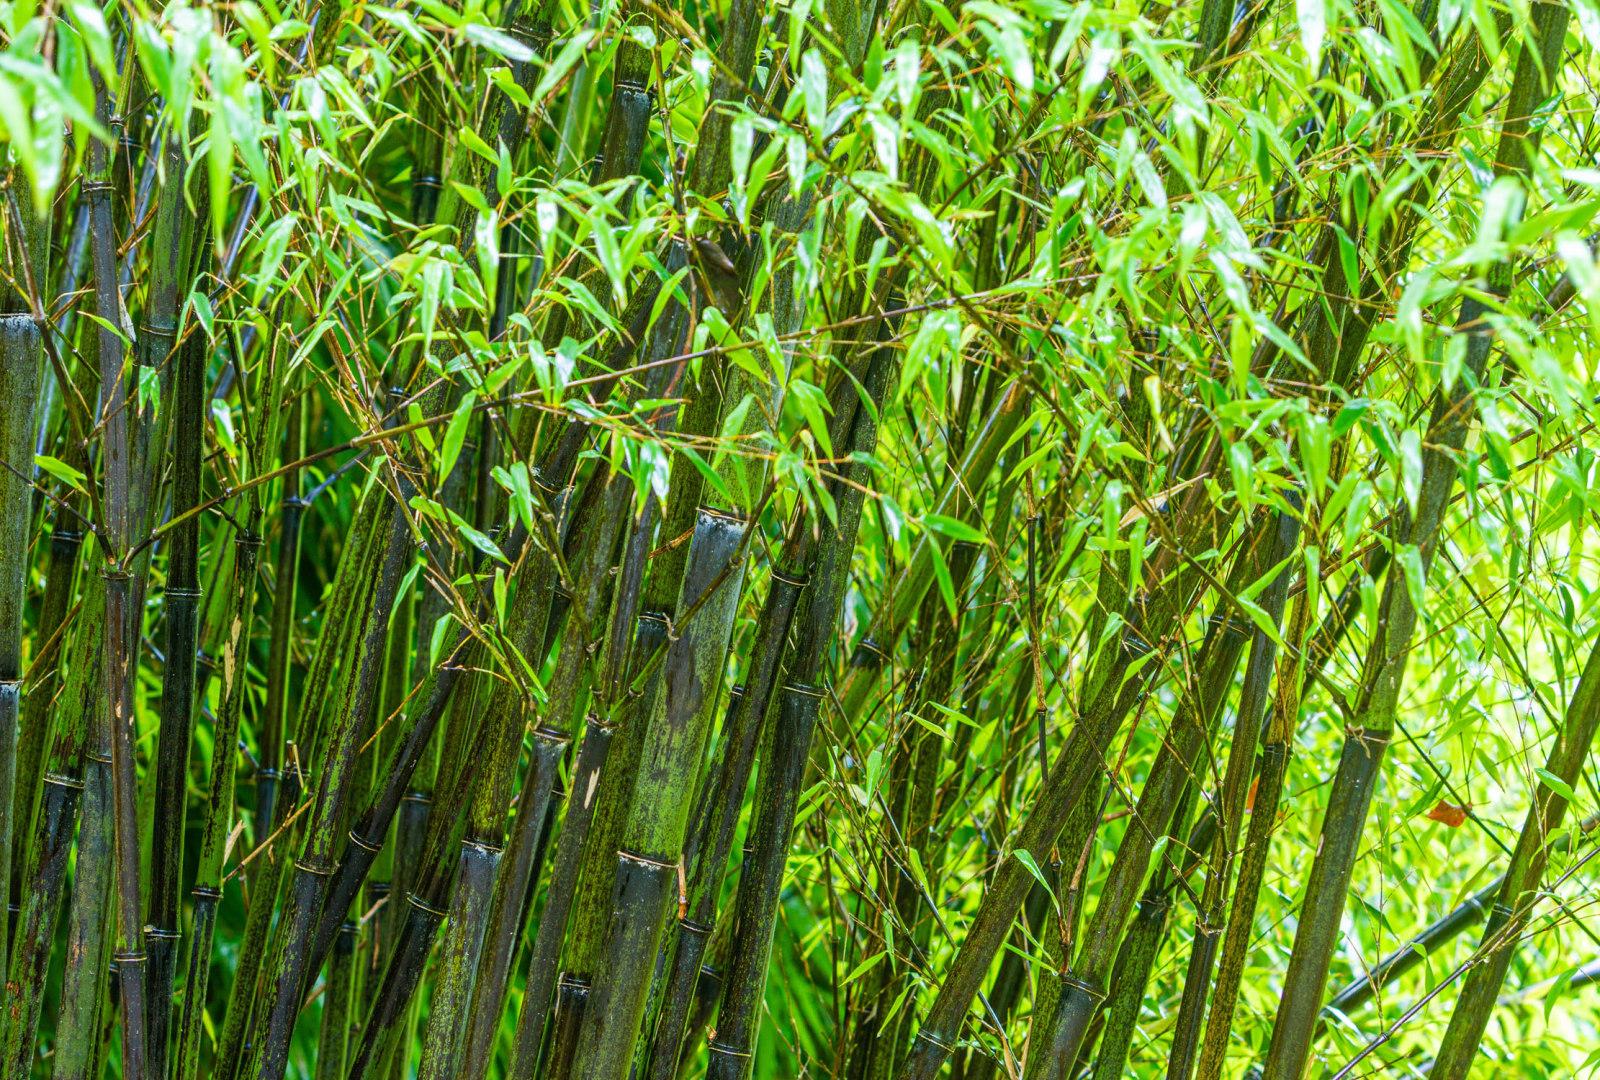 Phyllostachys nigra bamboo at trebah